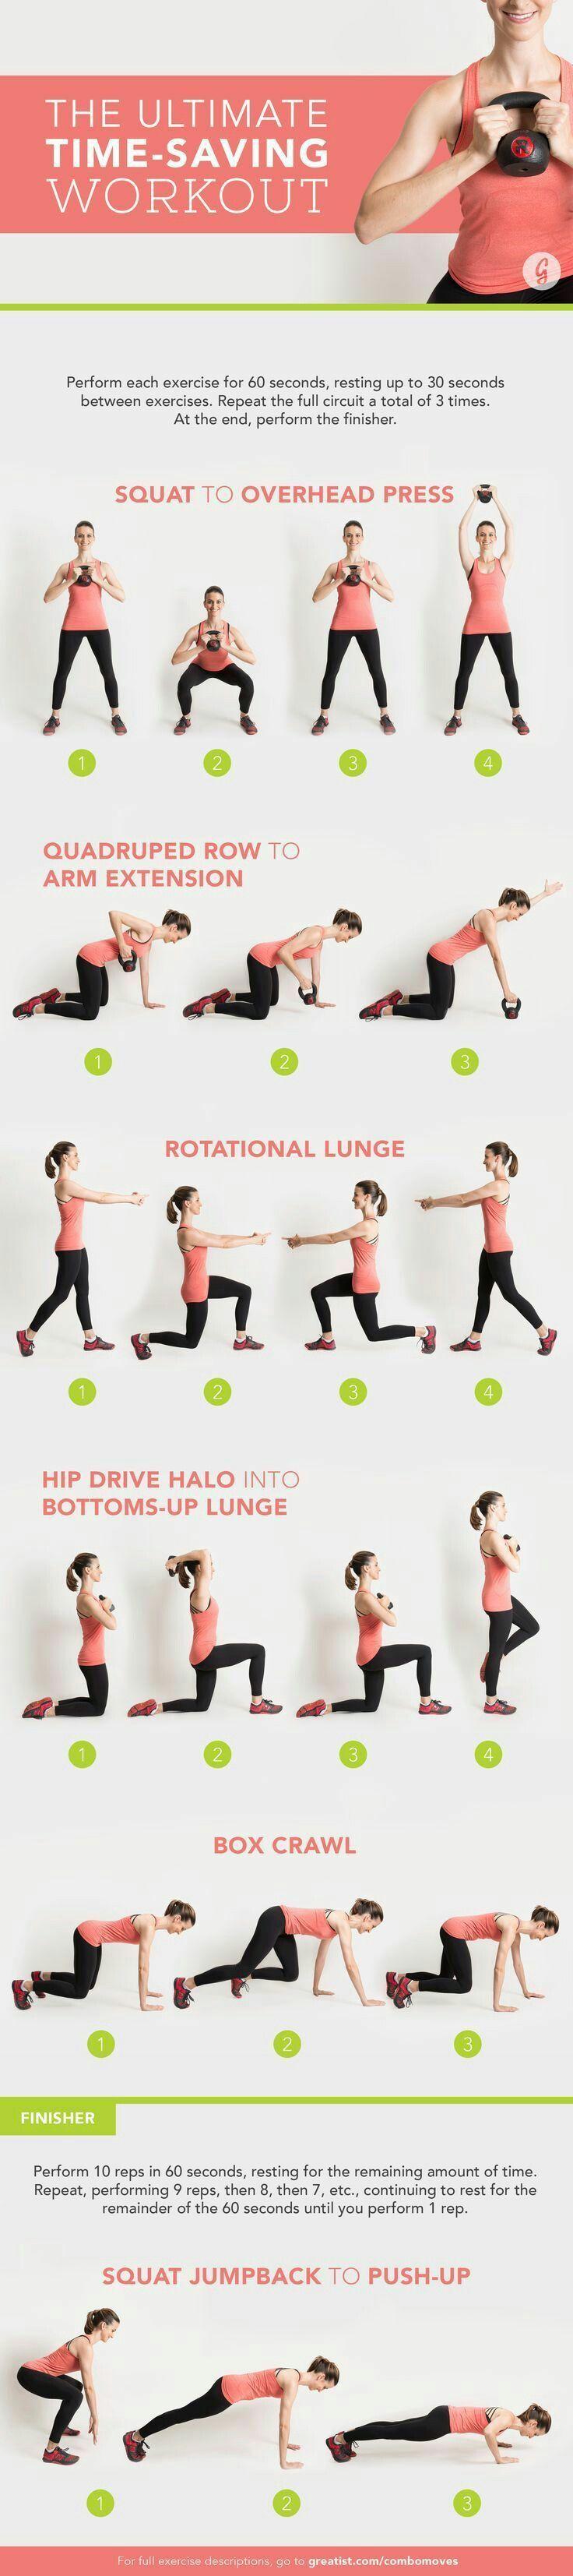 time saving workout routine